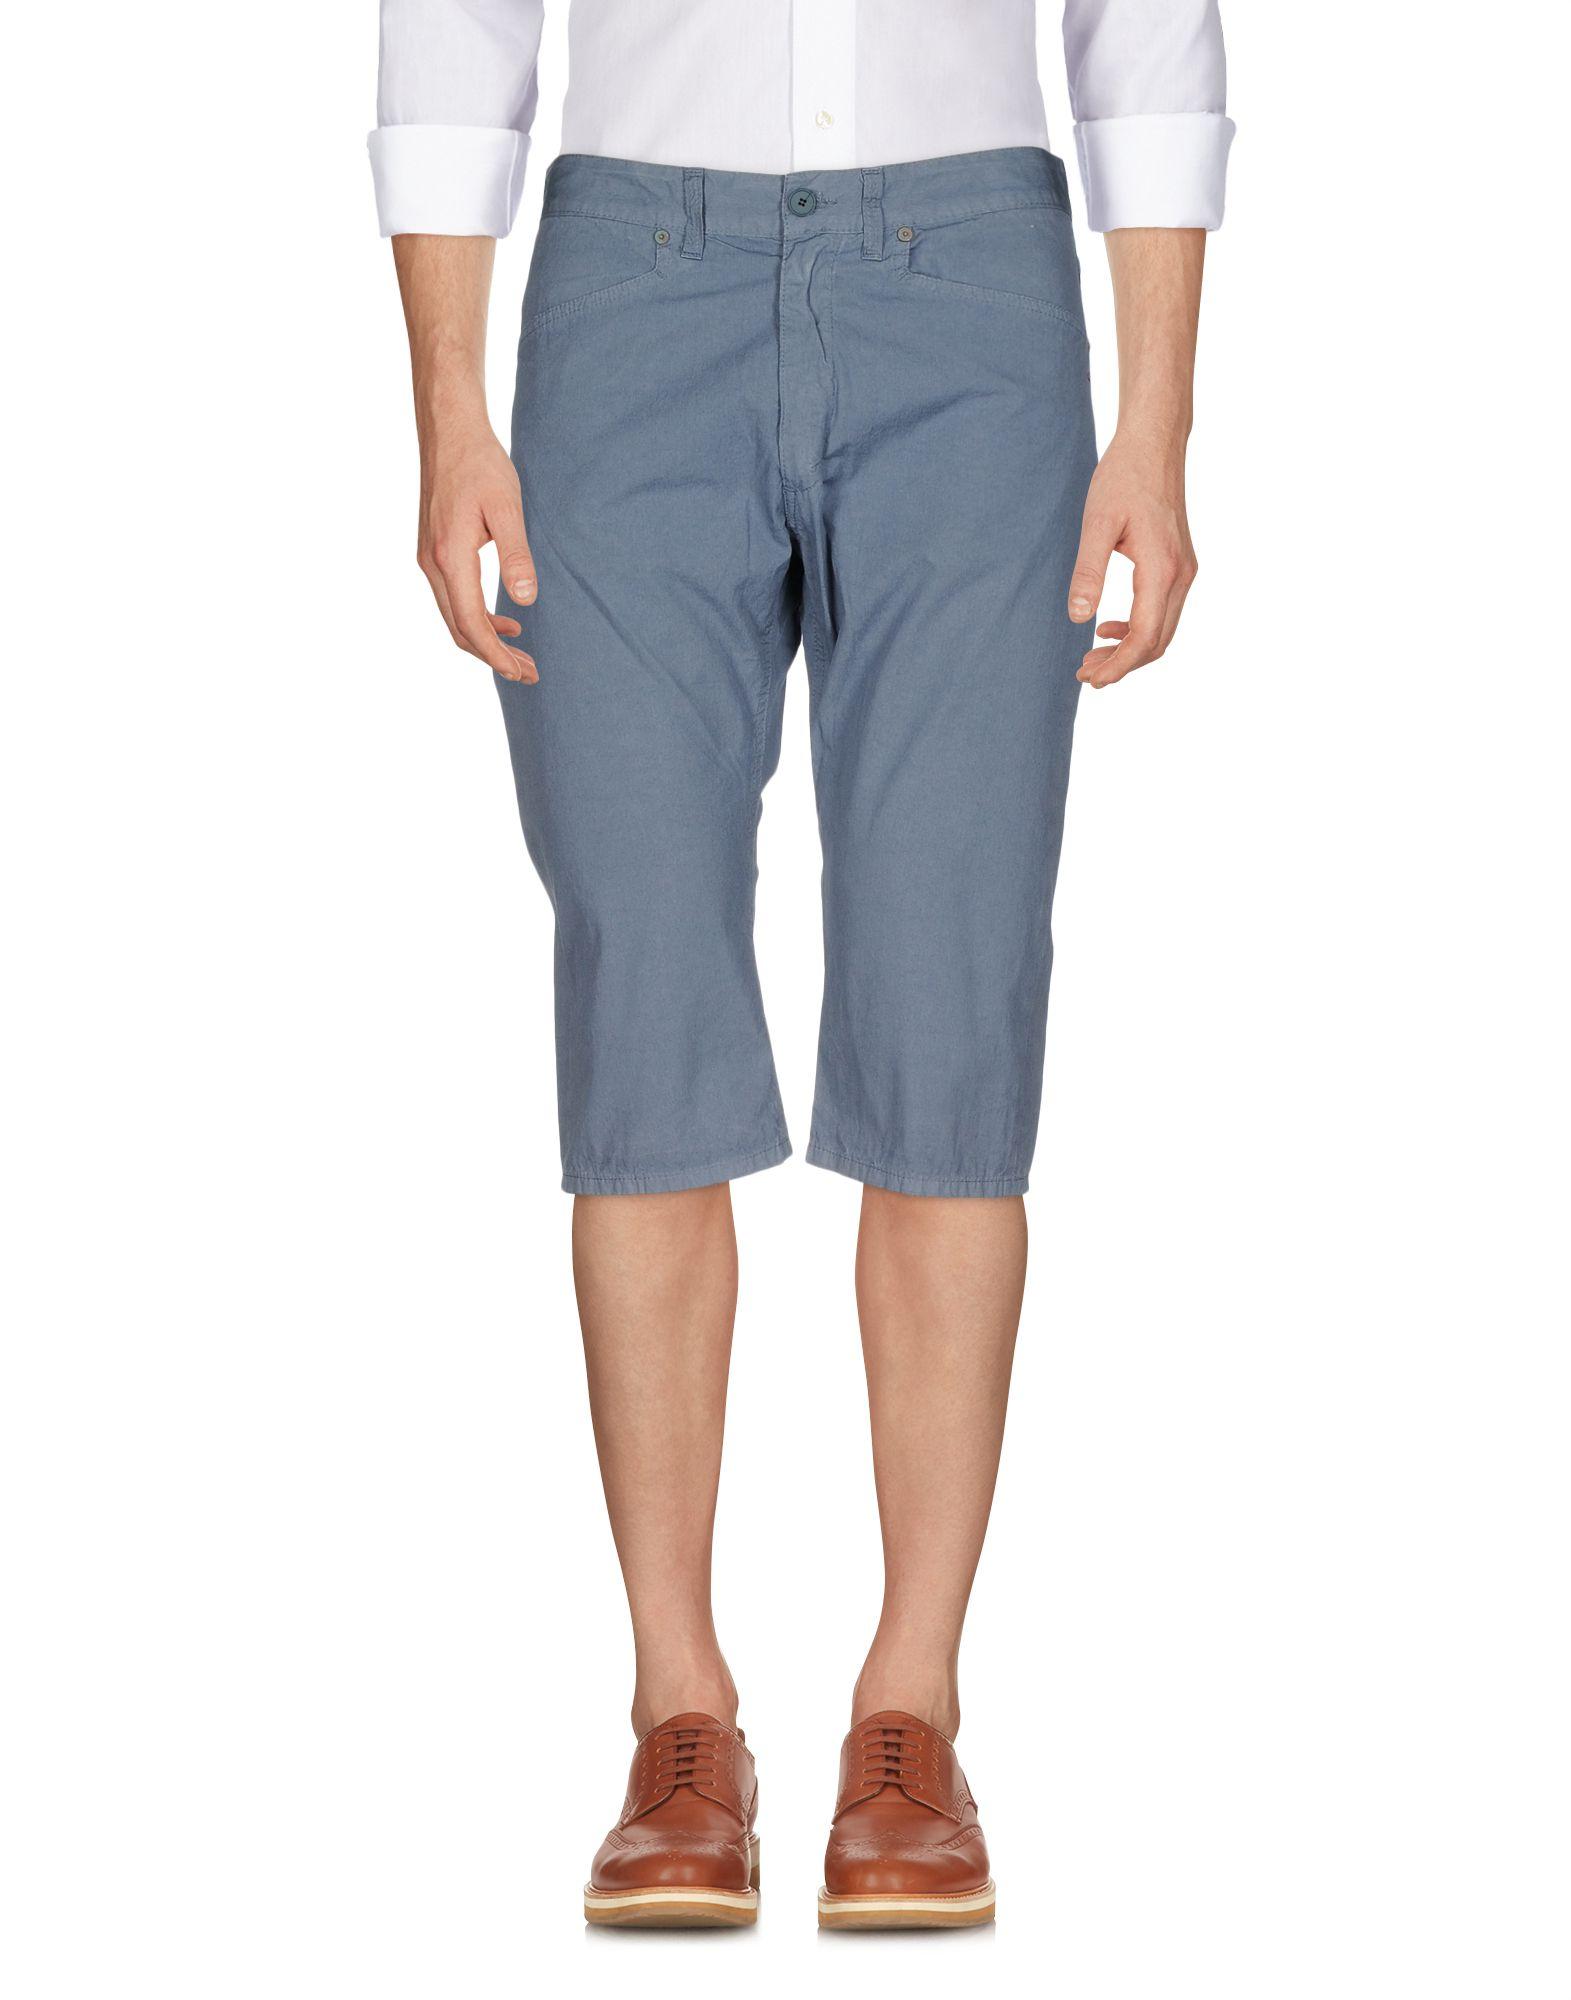 Pantalone Capri Dondup Uomo - Acquista online su